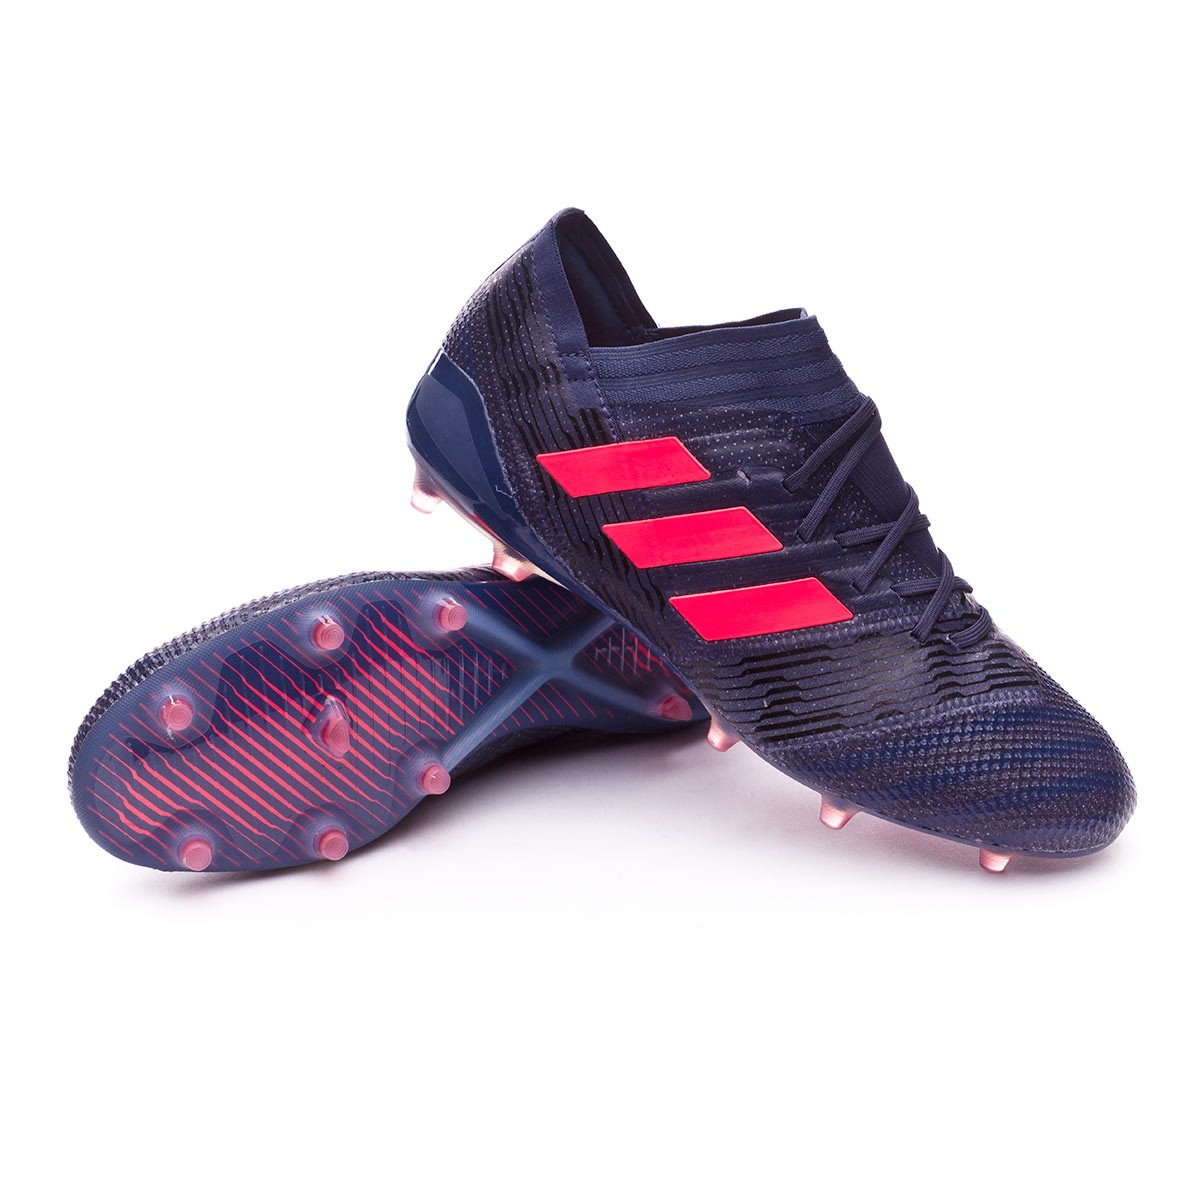 info for 32731 c1034 adidas Woman Nemeziz 17.1 FG Boot